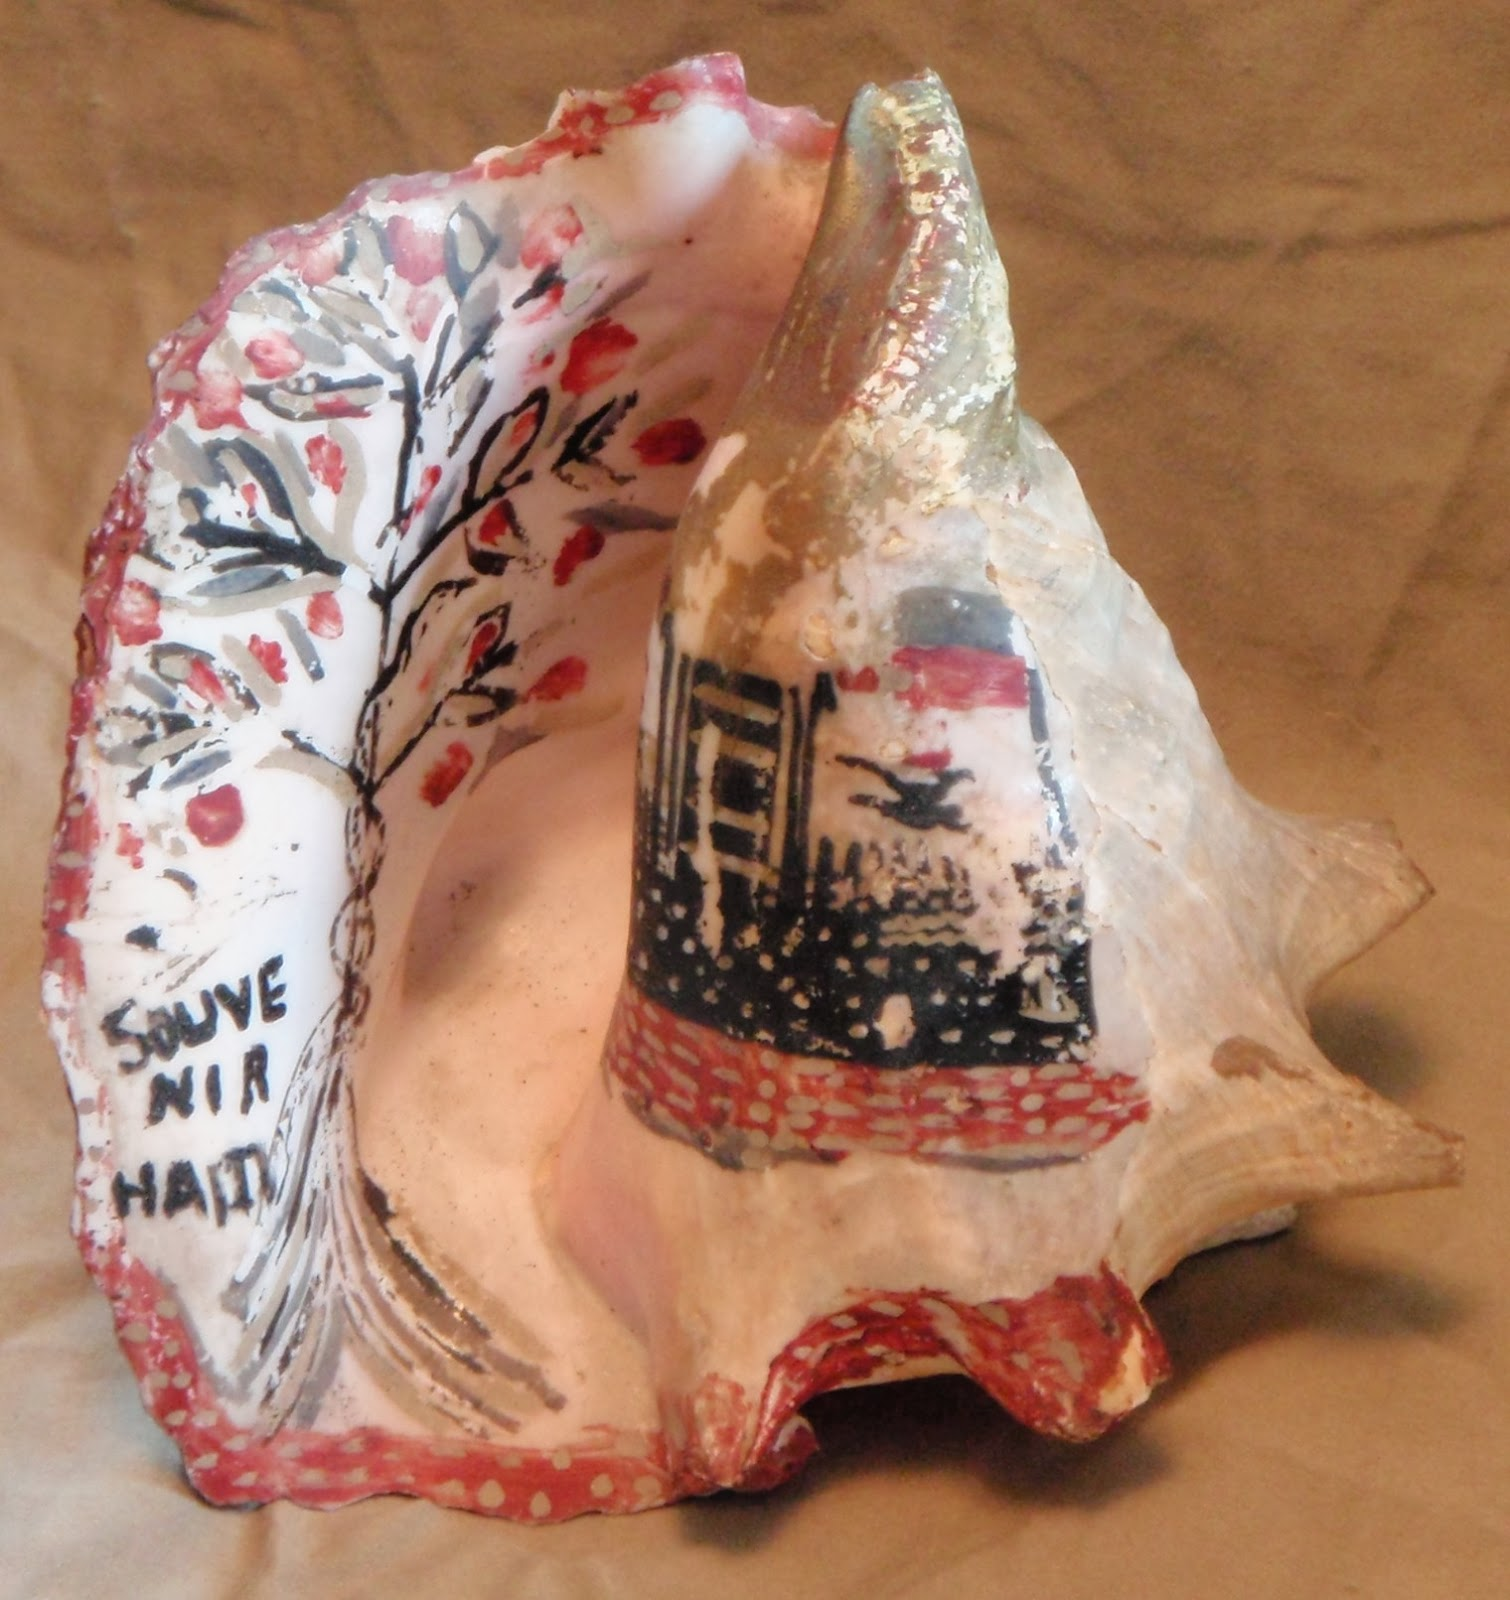 the painted conch shells of haiti classic folk art of